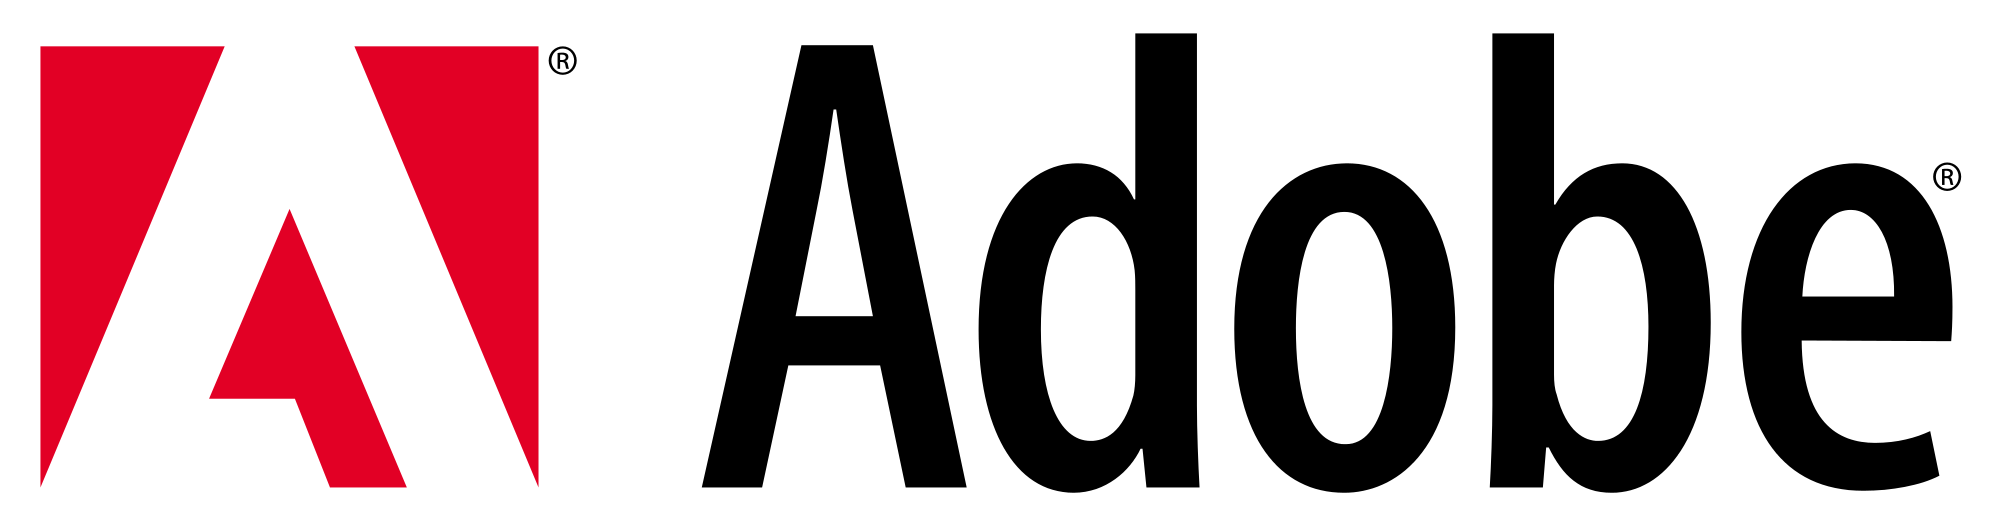 Adobe Digital Asset Management logo